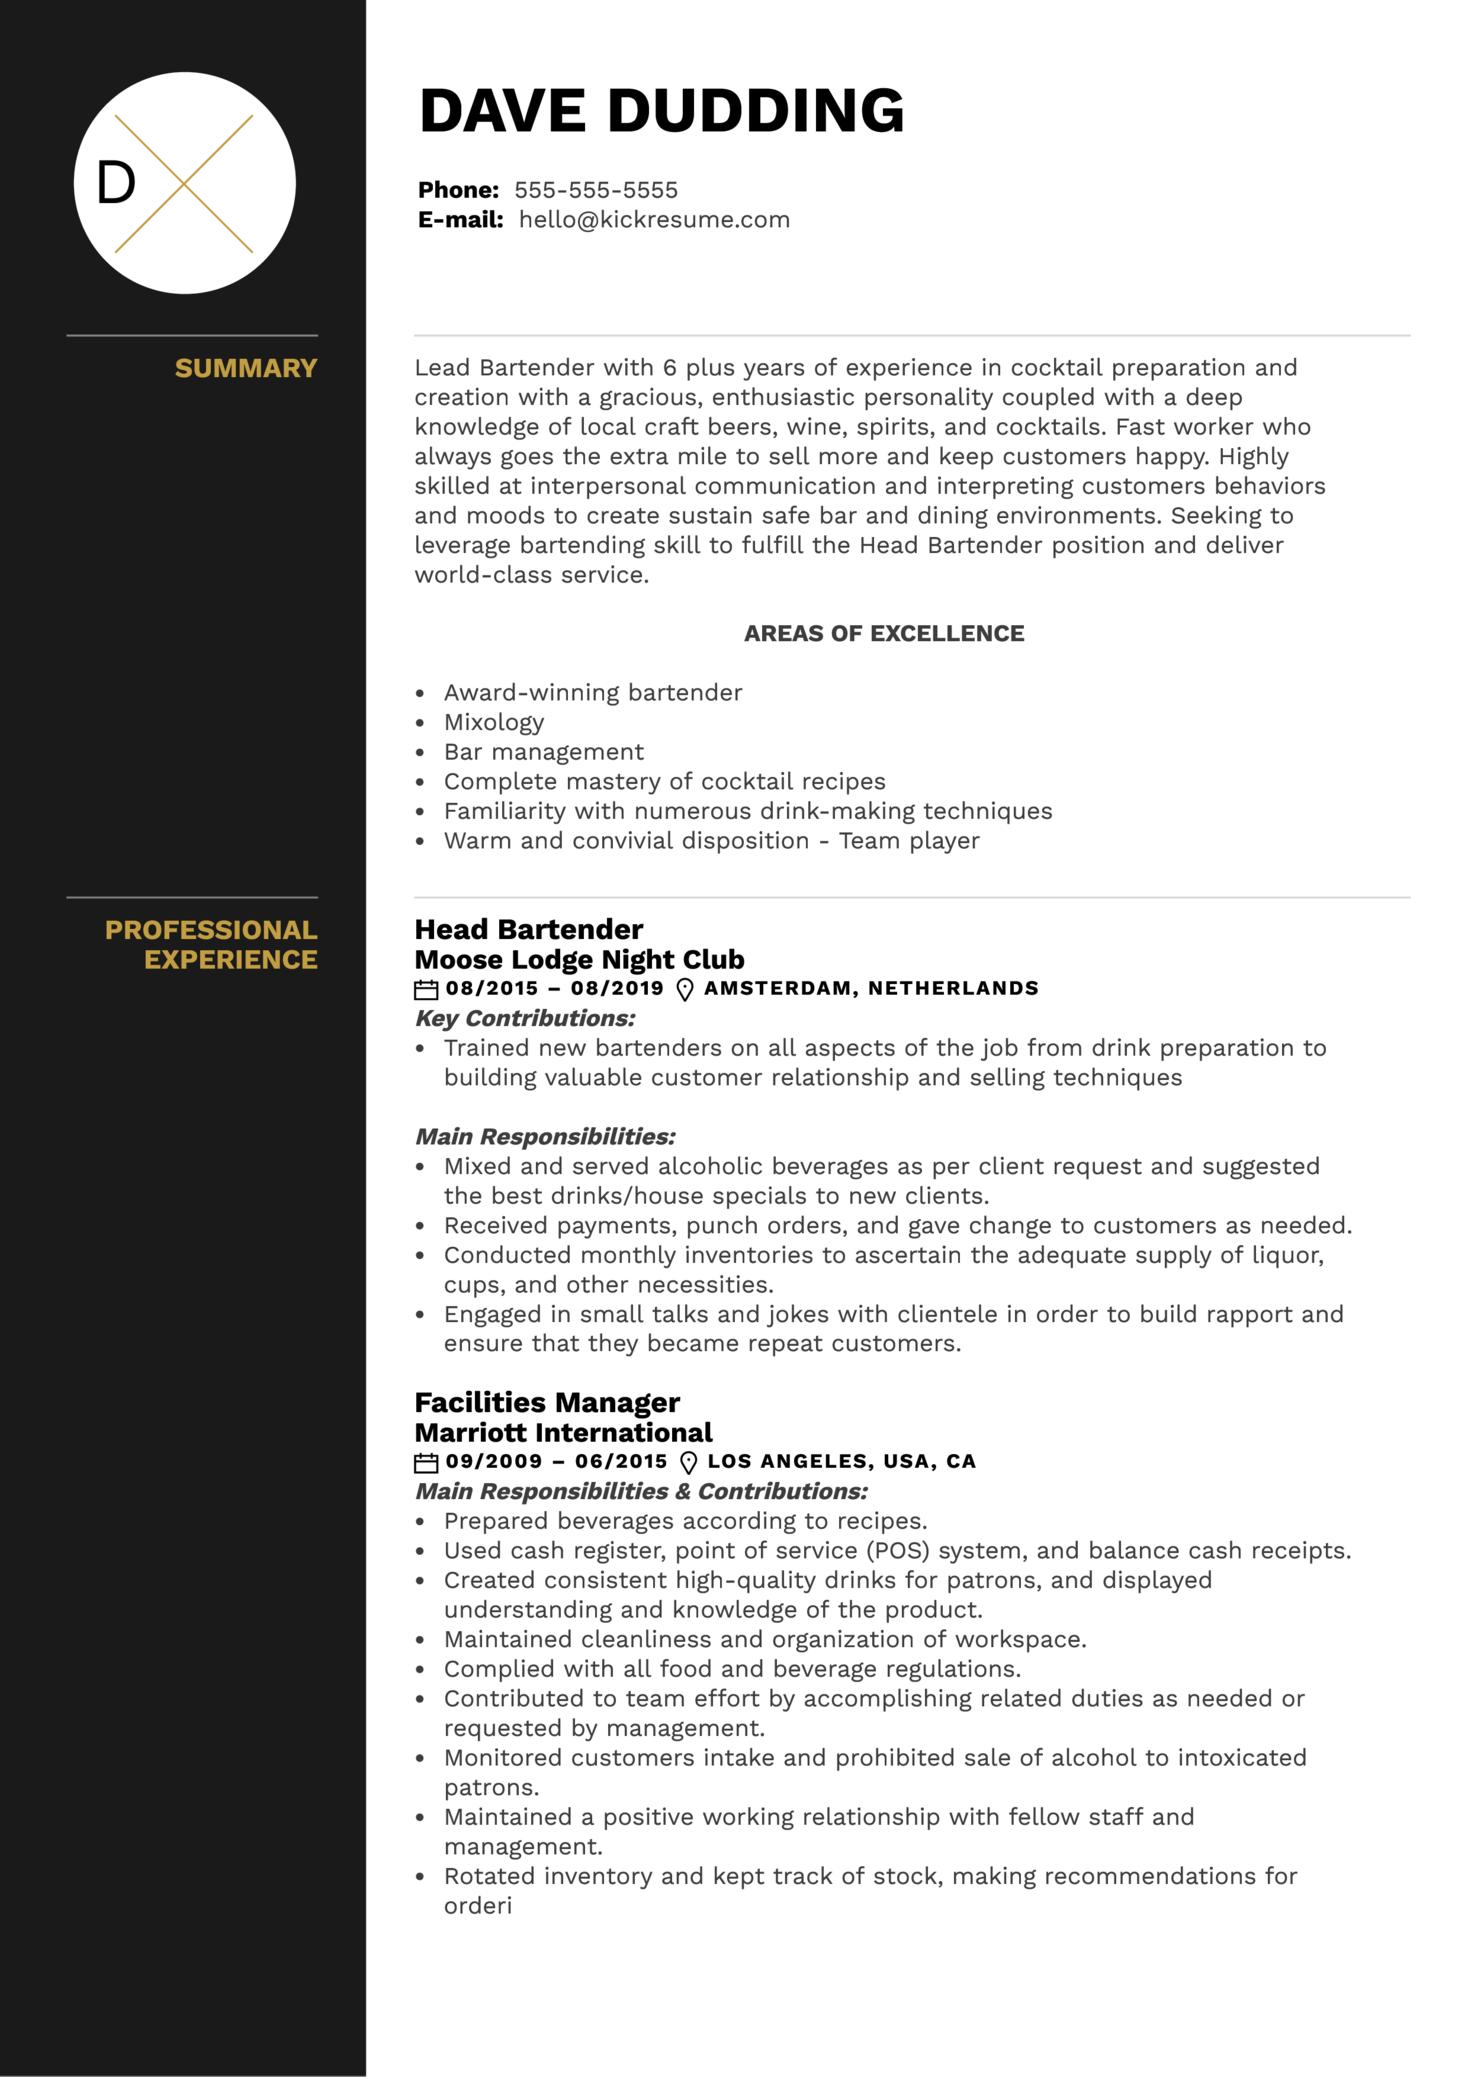 Head Bartender Resume Example (Part 1)